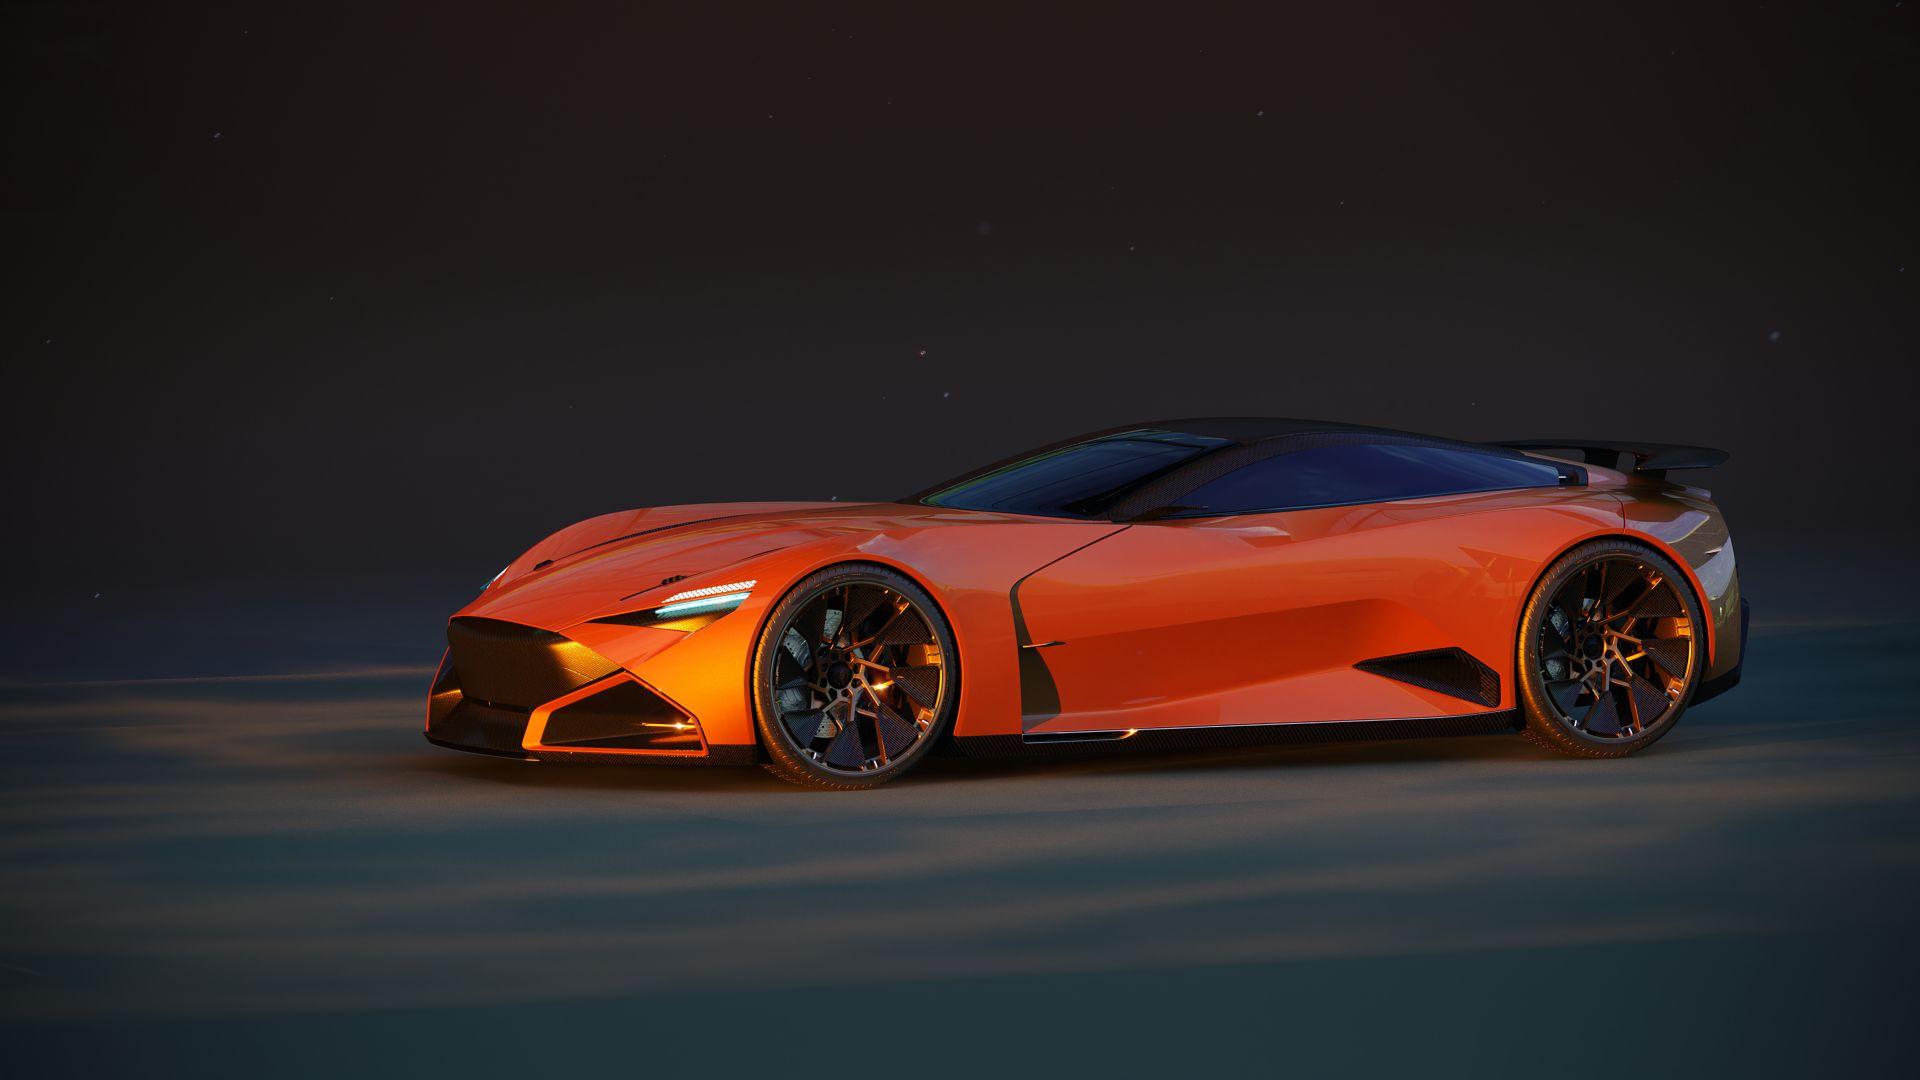 Orange Continental Supercar